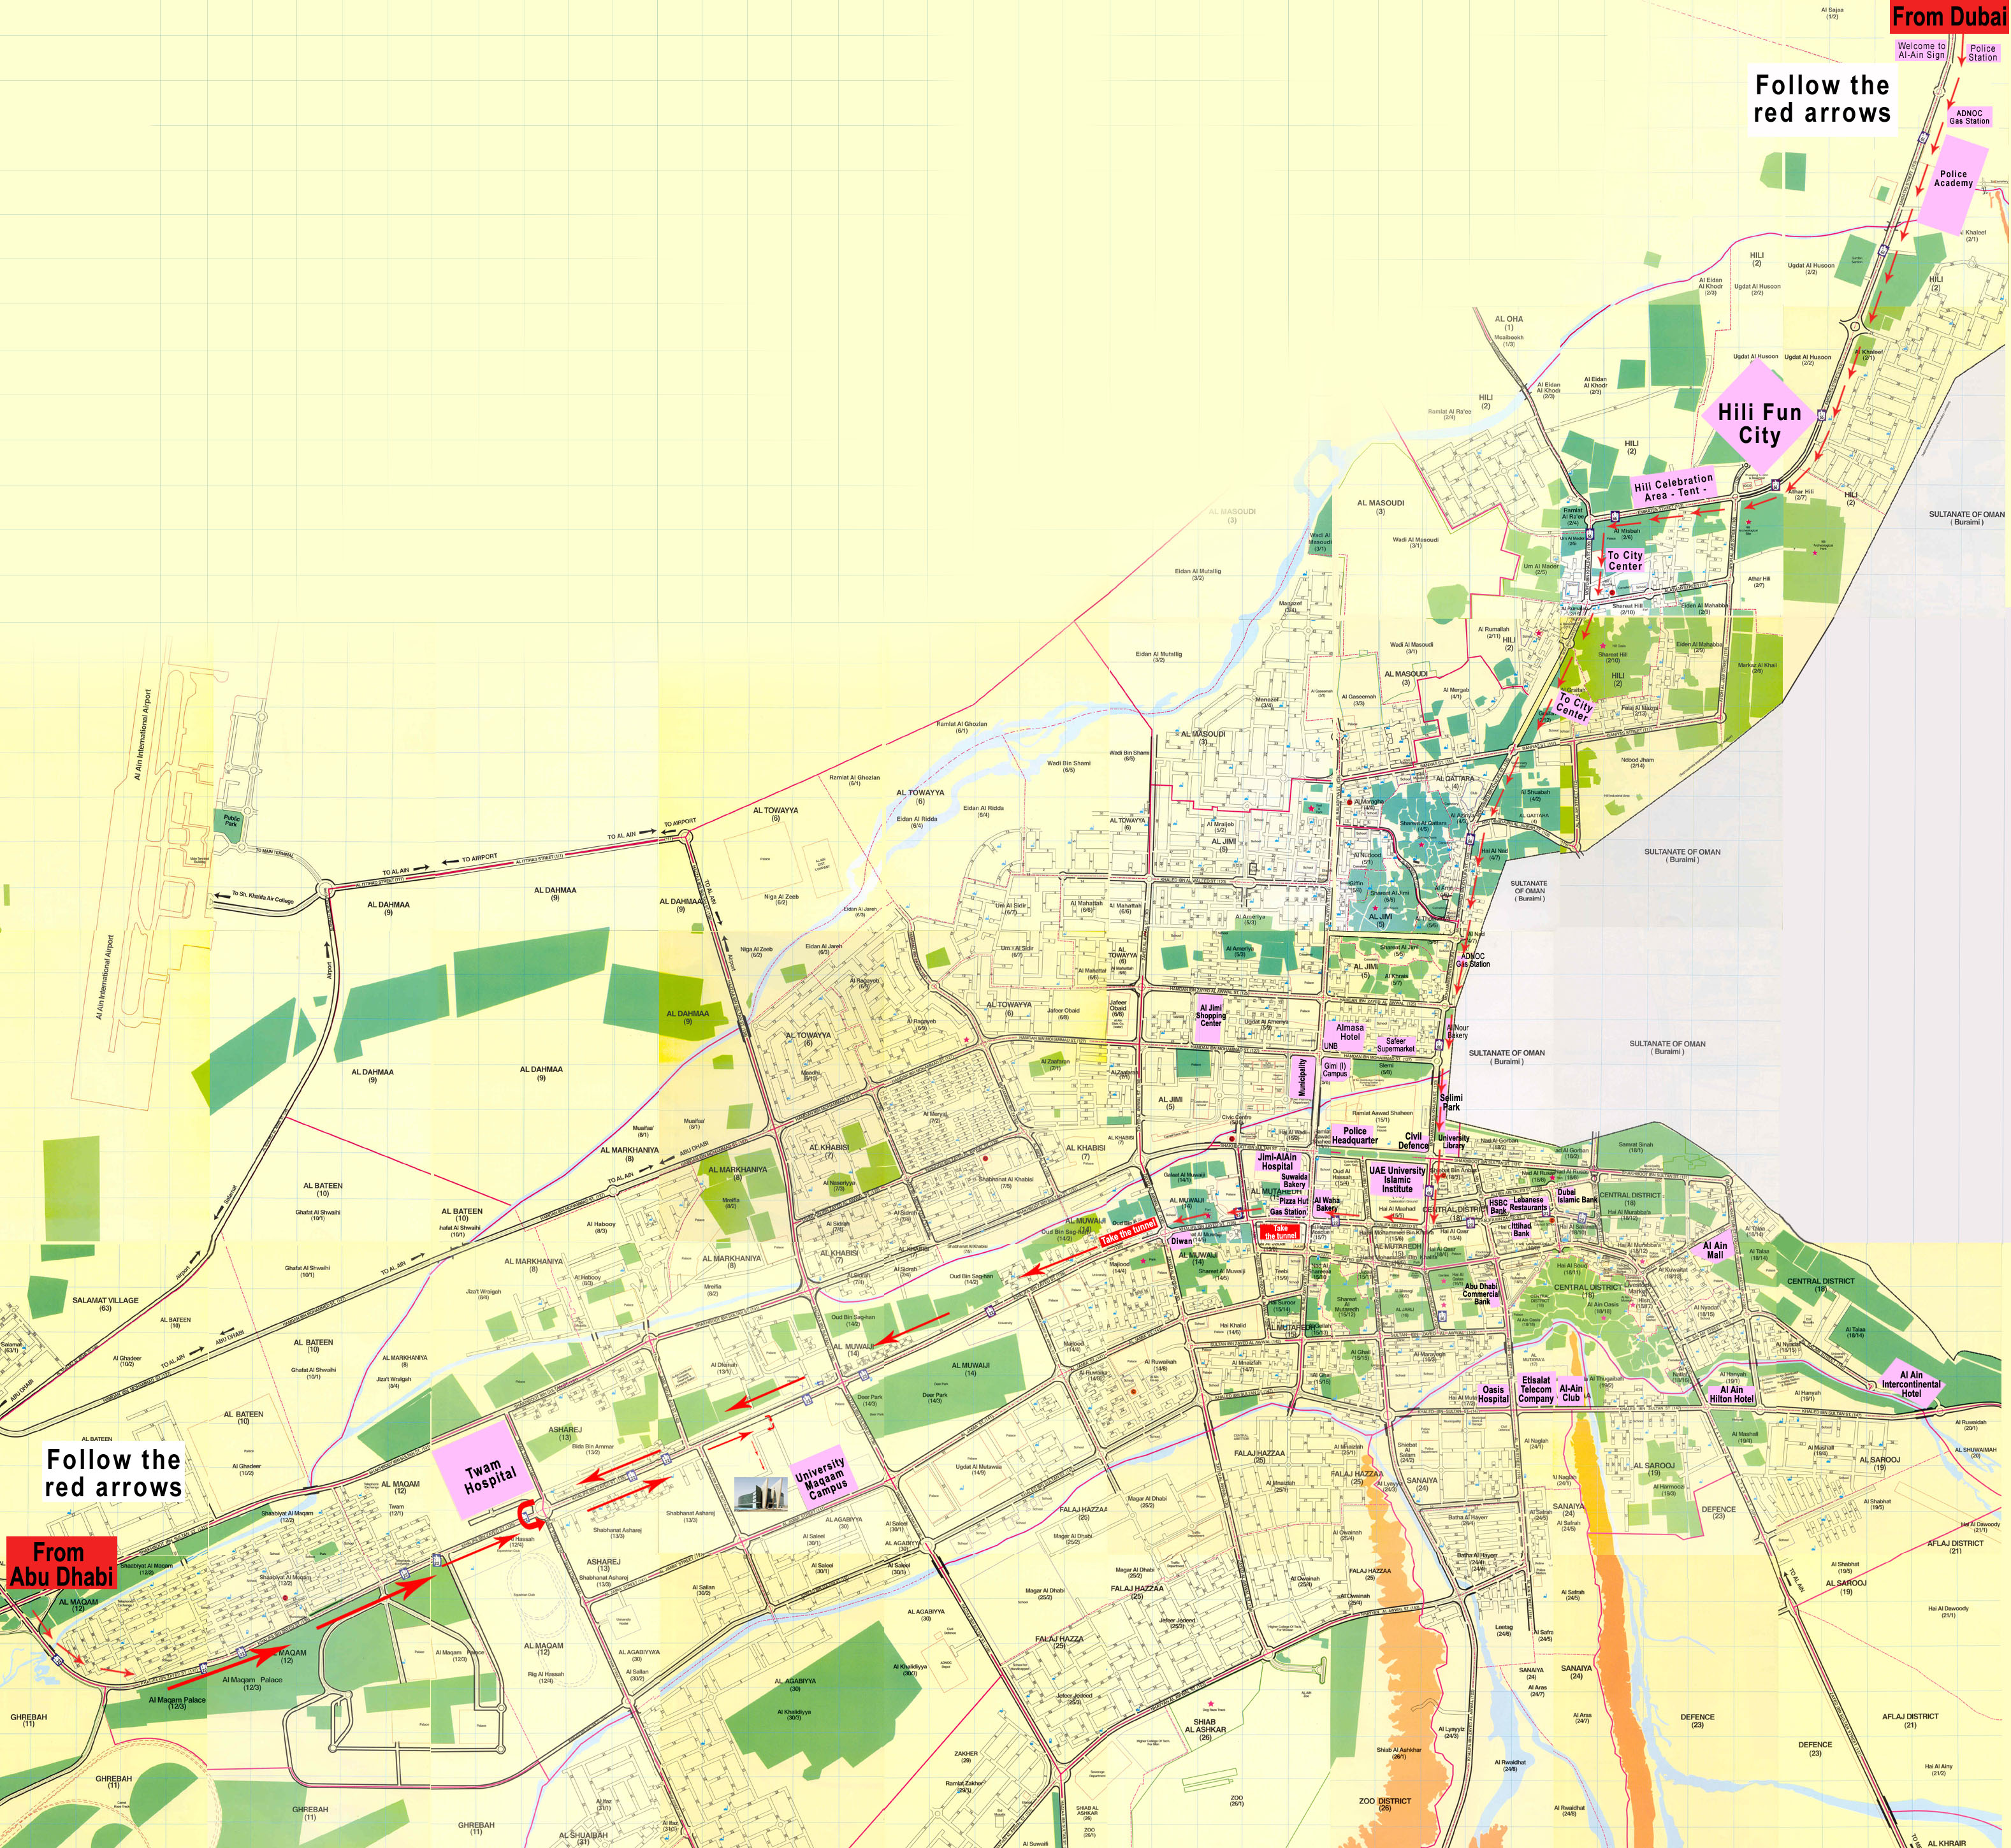 MapDubai To Alain CITjpg - Al ain map